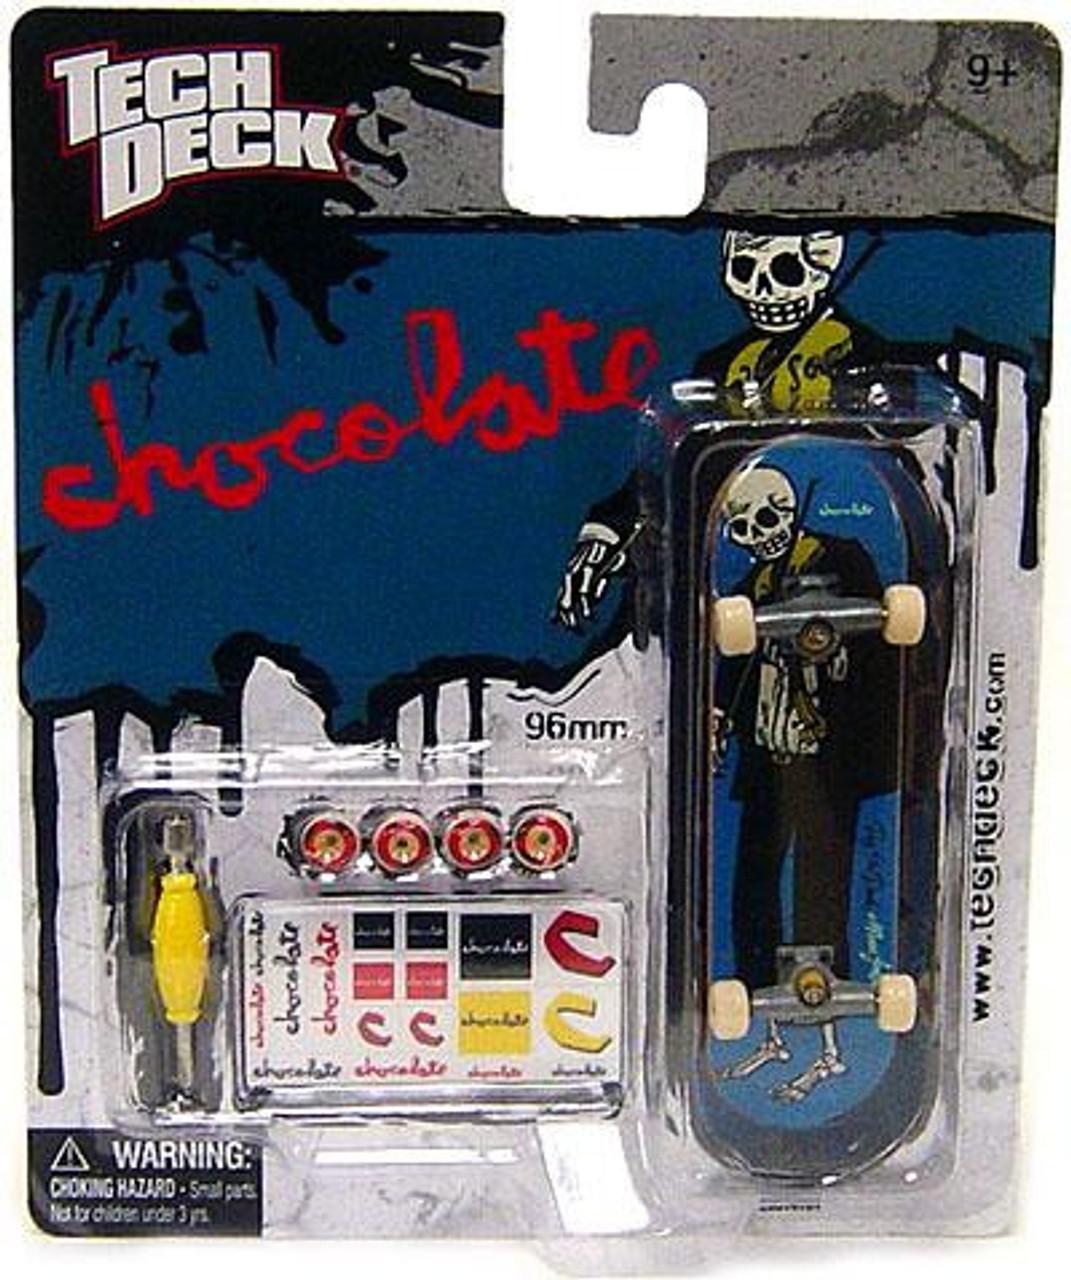 TECH DECK SINGLE  PACK CHOCOLATE  96MM FINGERBOARD SERIES 5